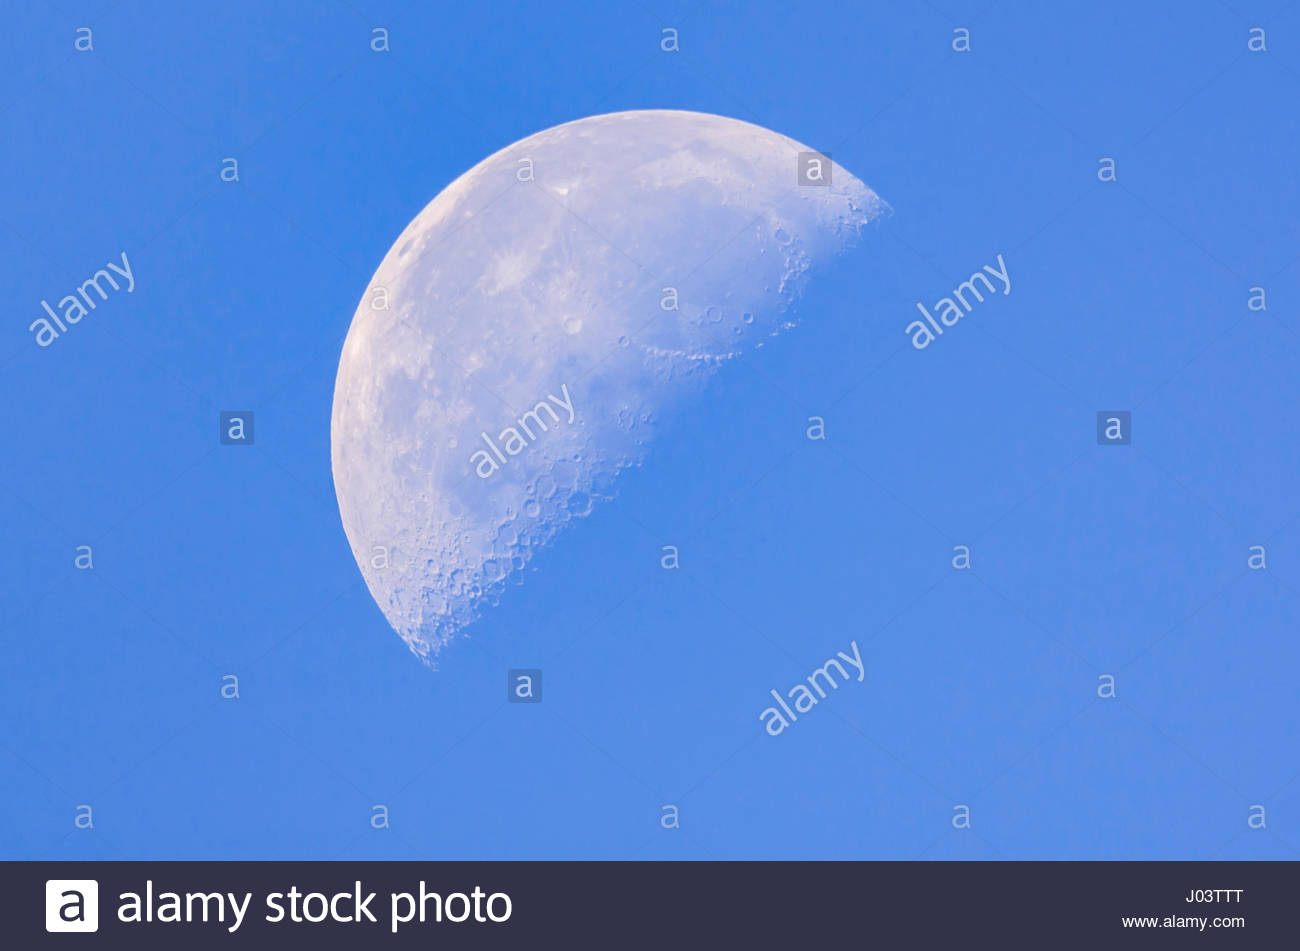 Third Quarter moon (AKA last quarter or half moon) phase of the moon in daytime against blue sky, in September. - Stock Image